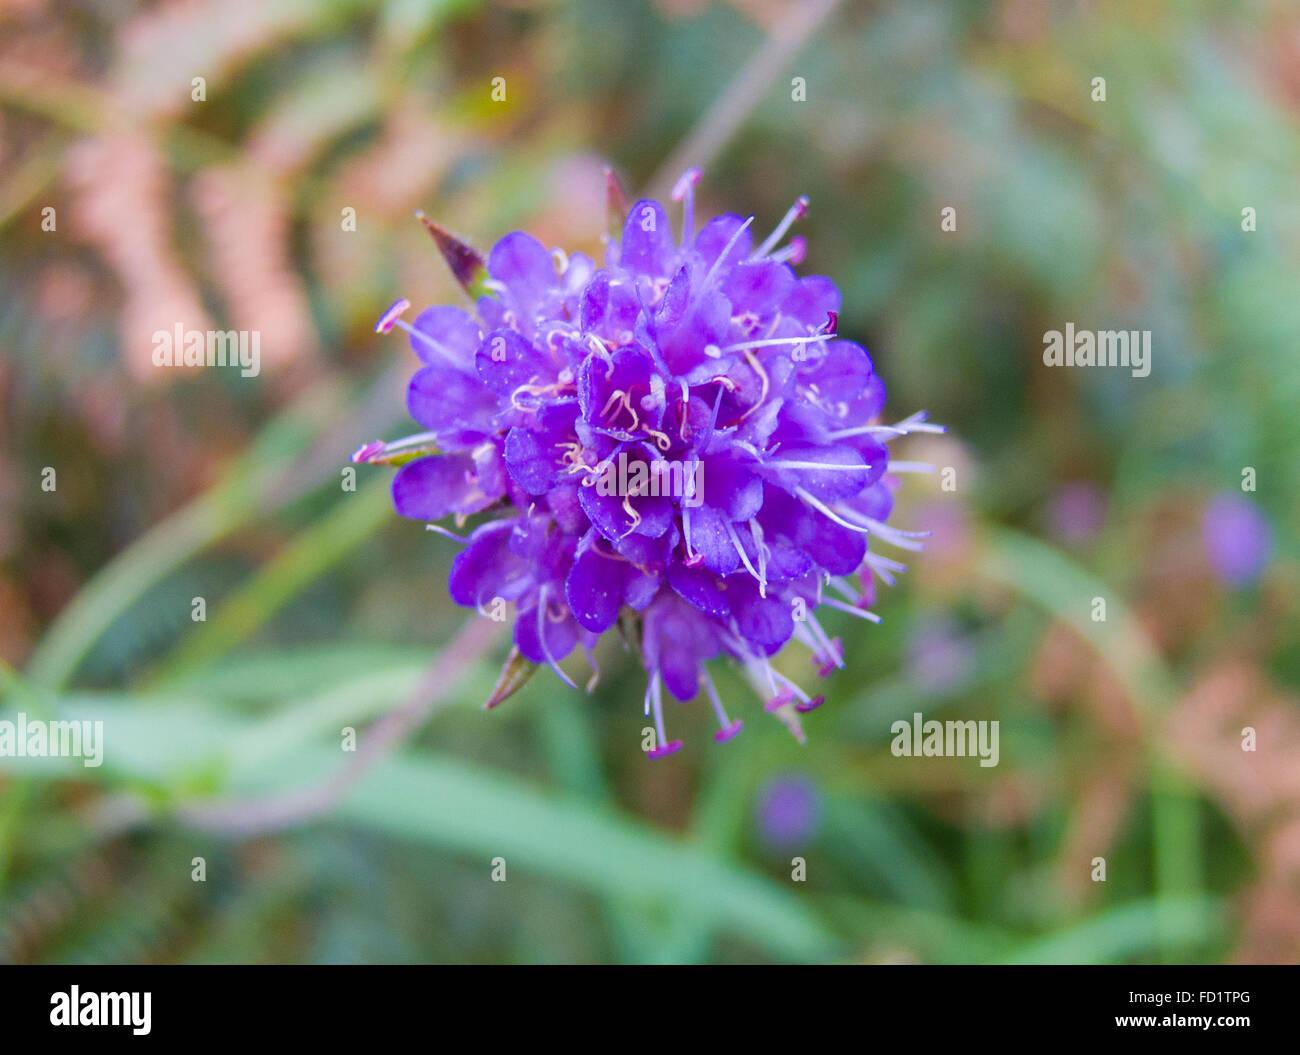 Devil's-Bit Scabious ( Succisa pratensis ) in Flower, UK - Stock Image